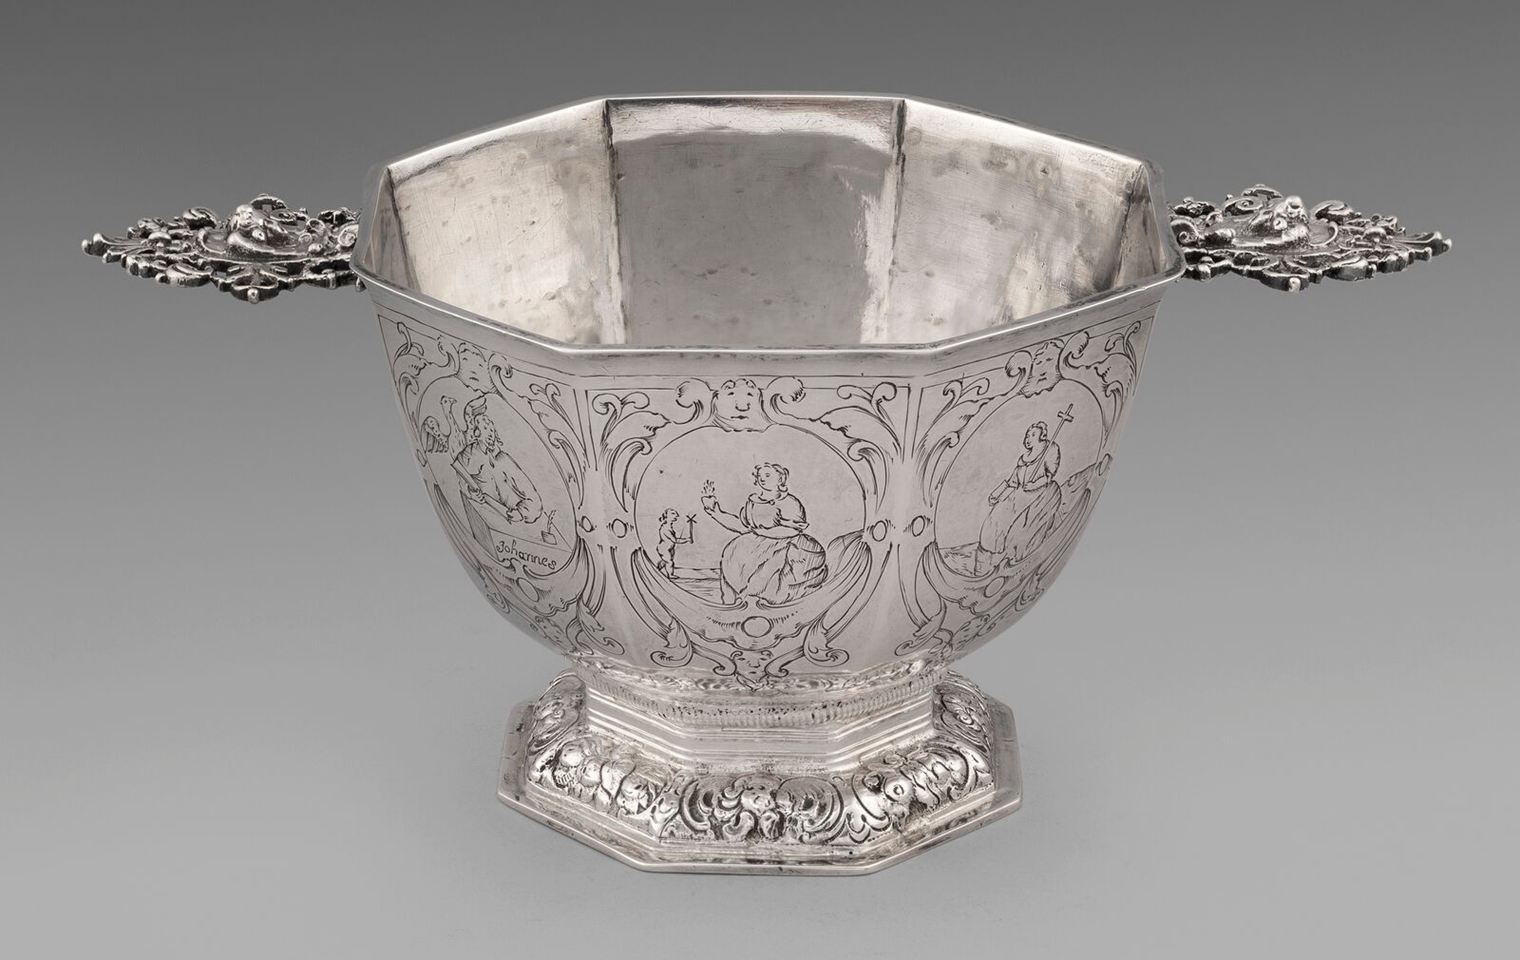 An Early 18th Century Dutch Octagonal Brandy Bowl